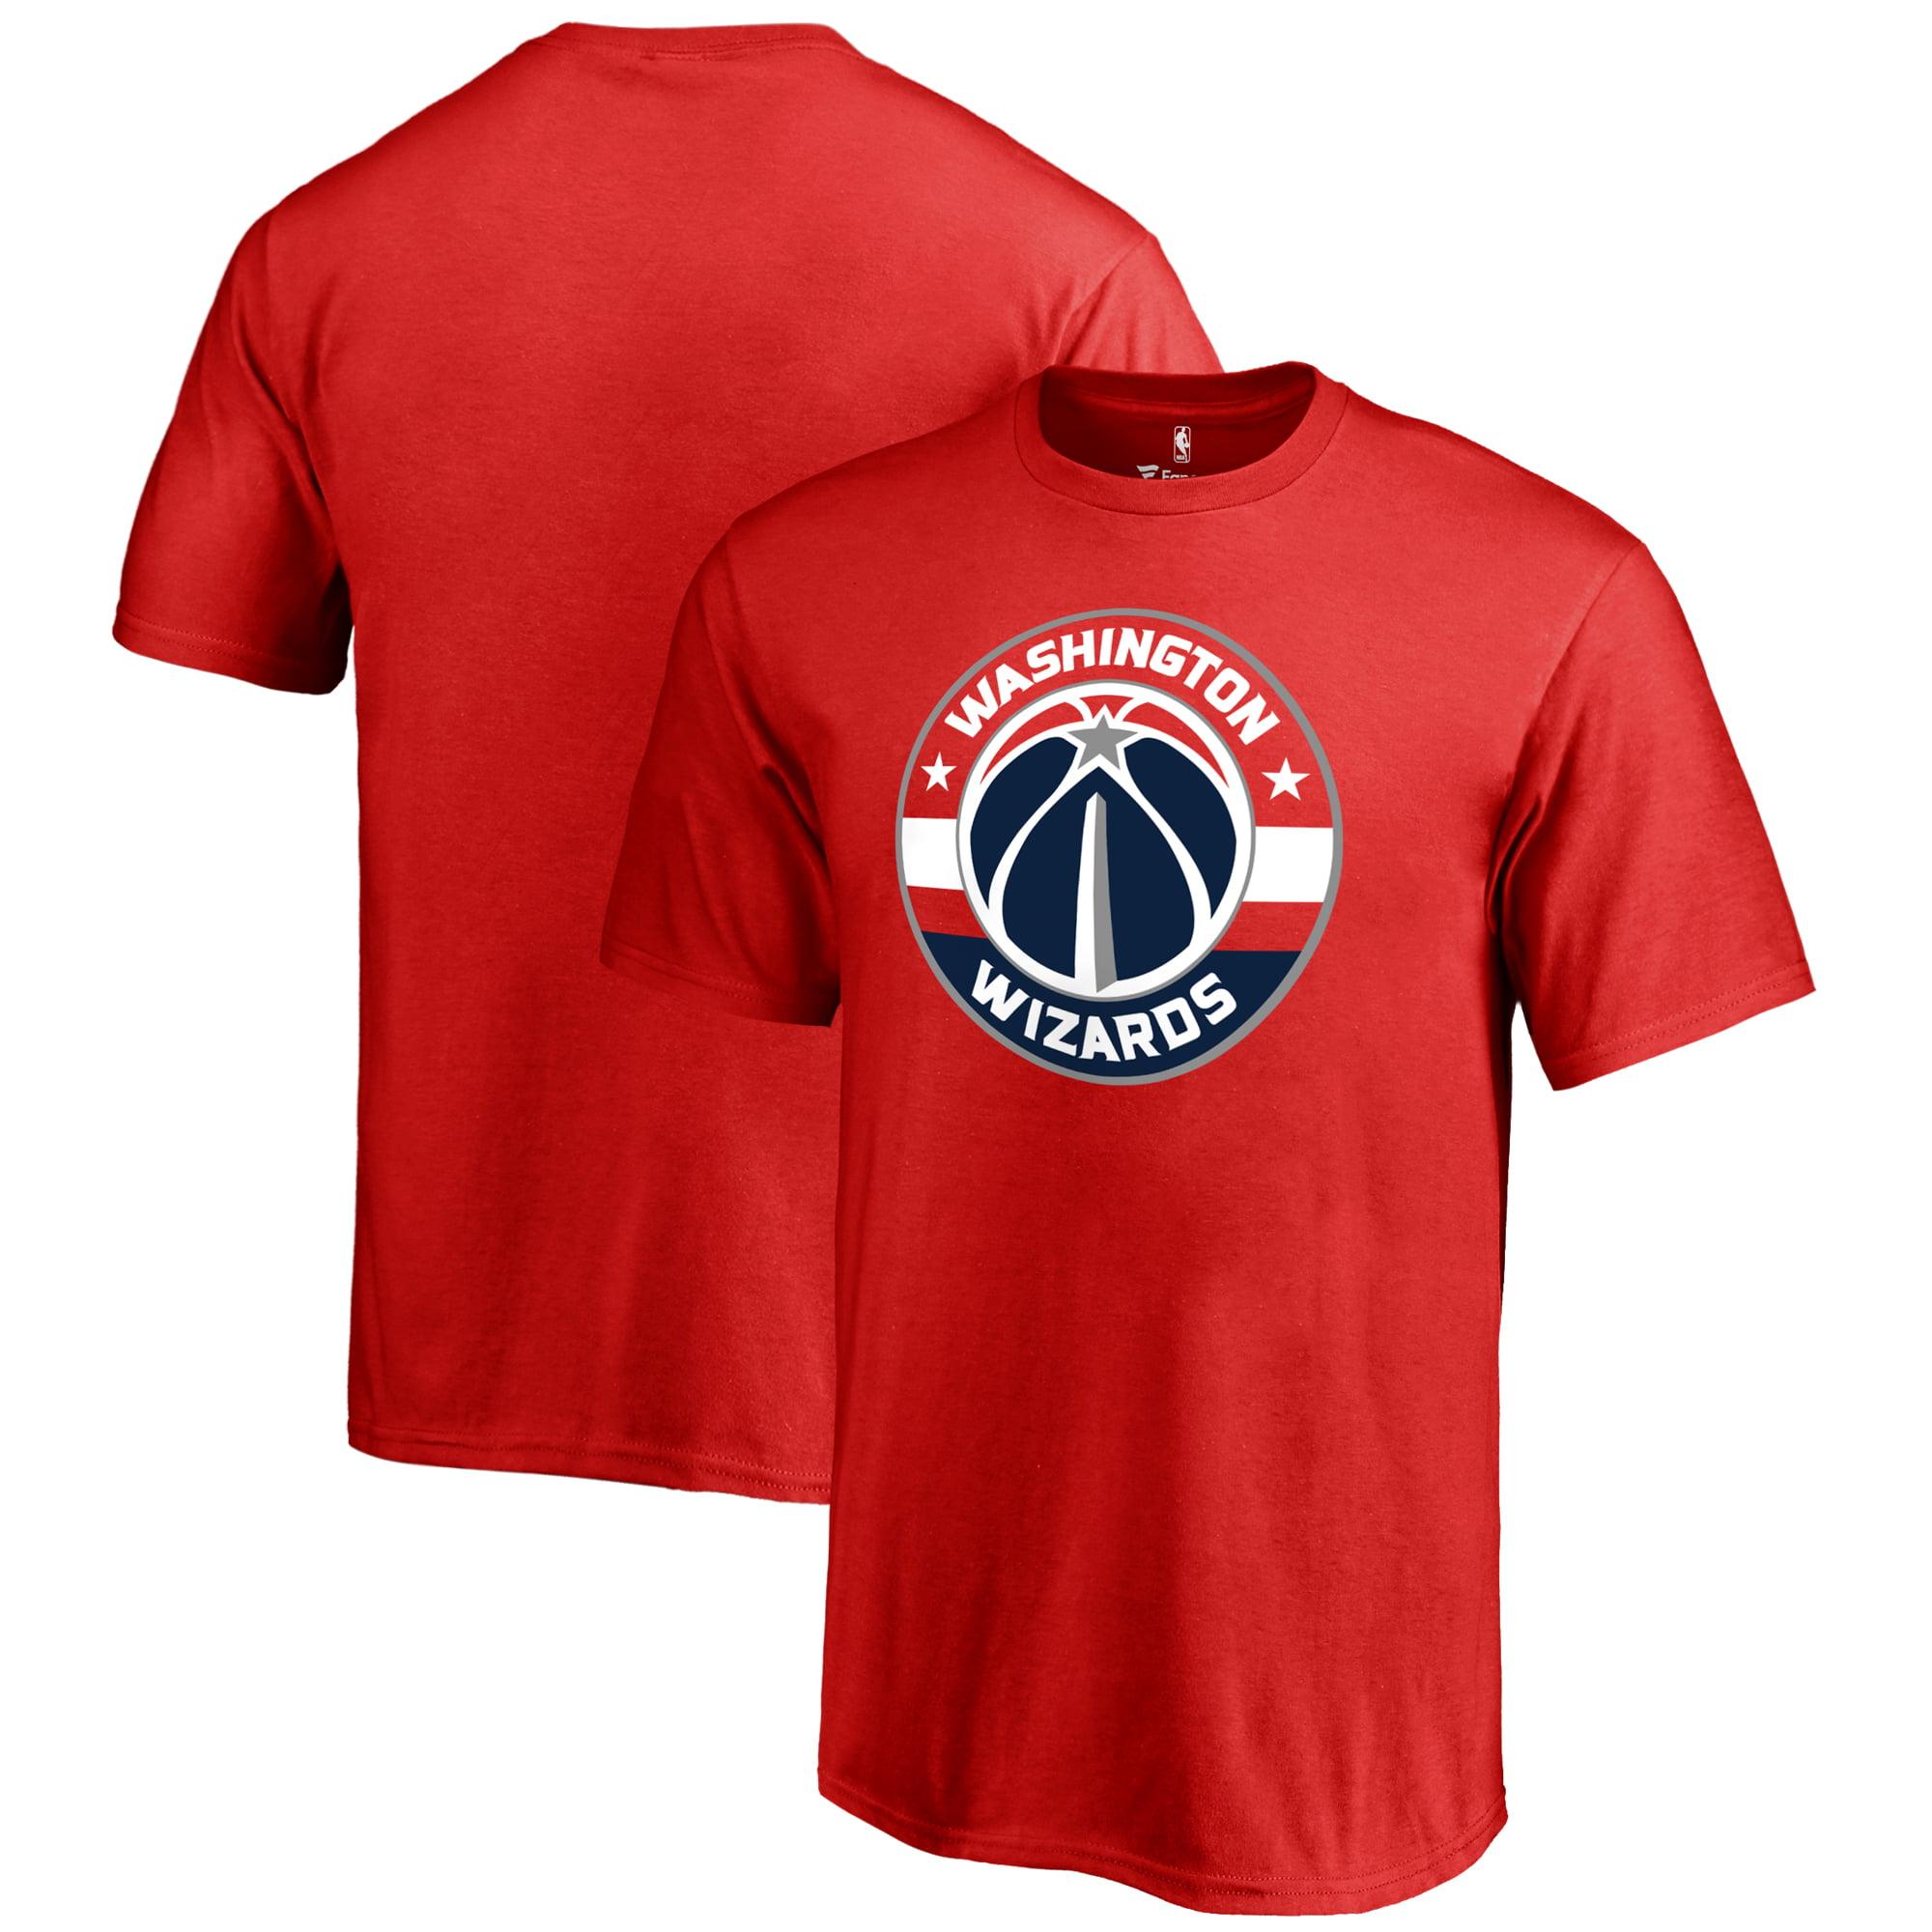 Washington Wizards Fanatics Branded Youth Primary Logo T-Shirt - Red